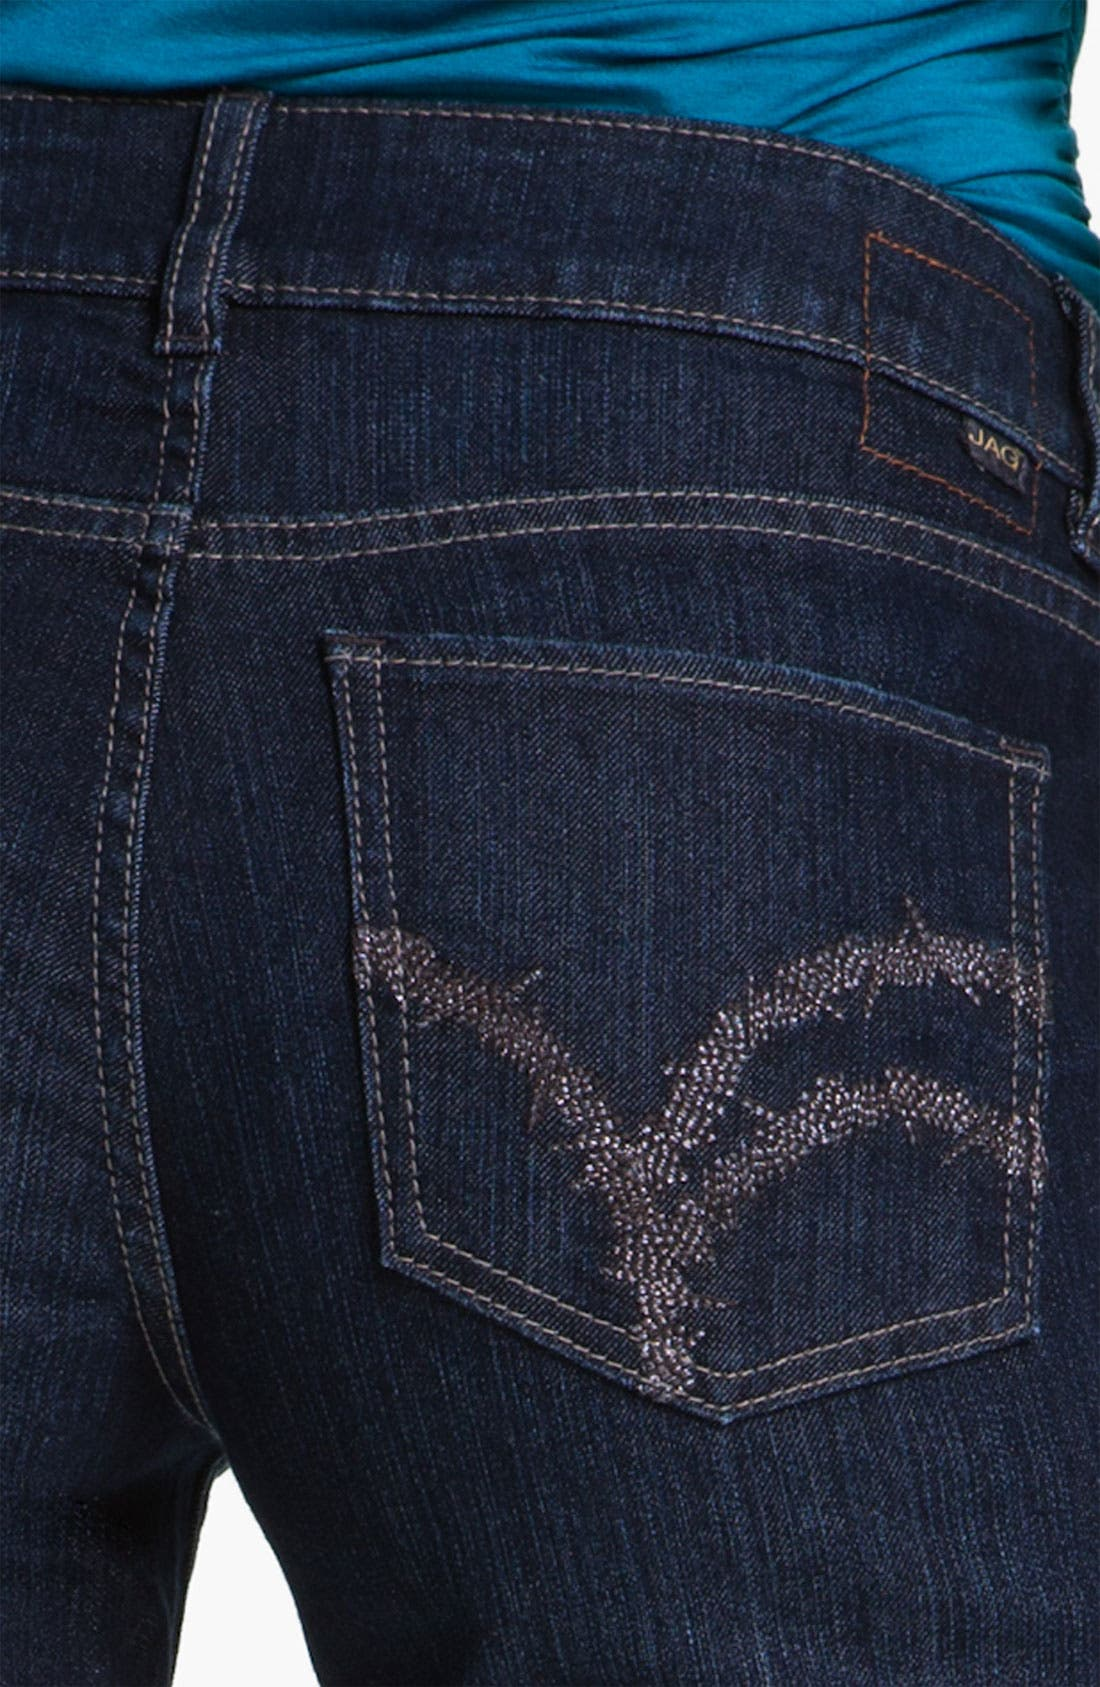 Alternate Image 3  - Jag Jeans 'Eden' Straight Leg Jeans (Indigo) (Petite)